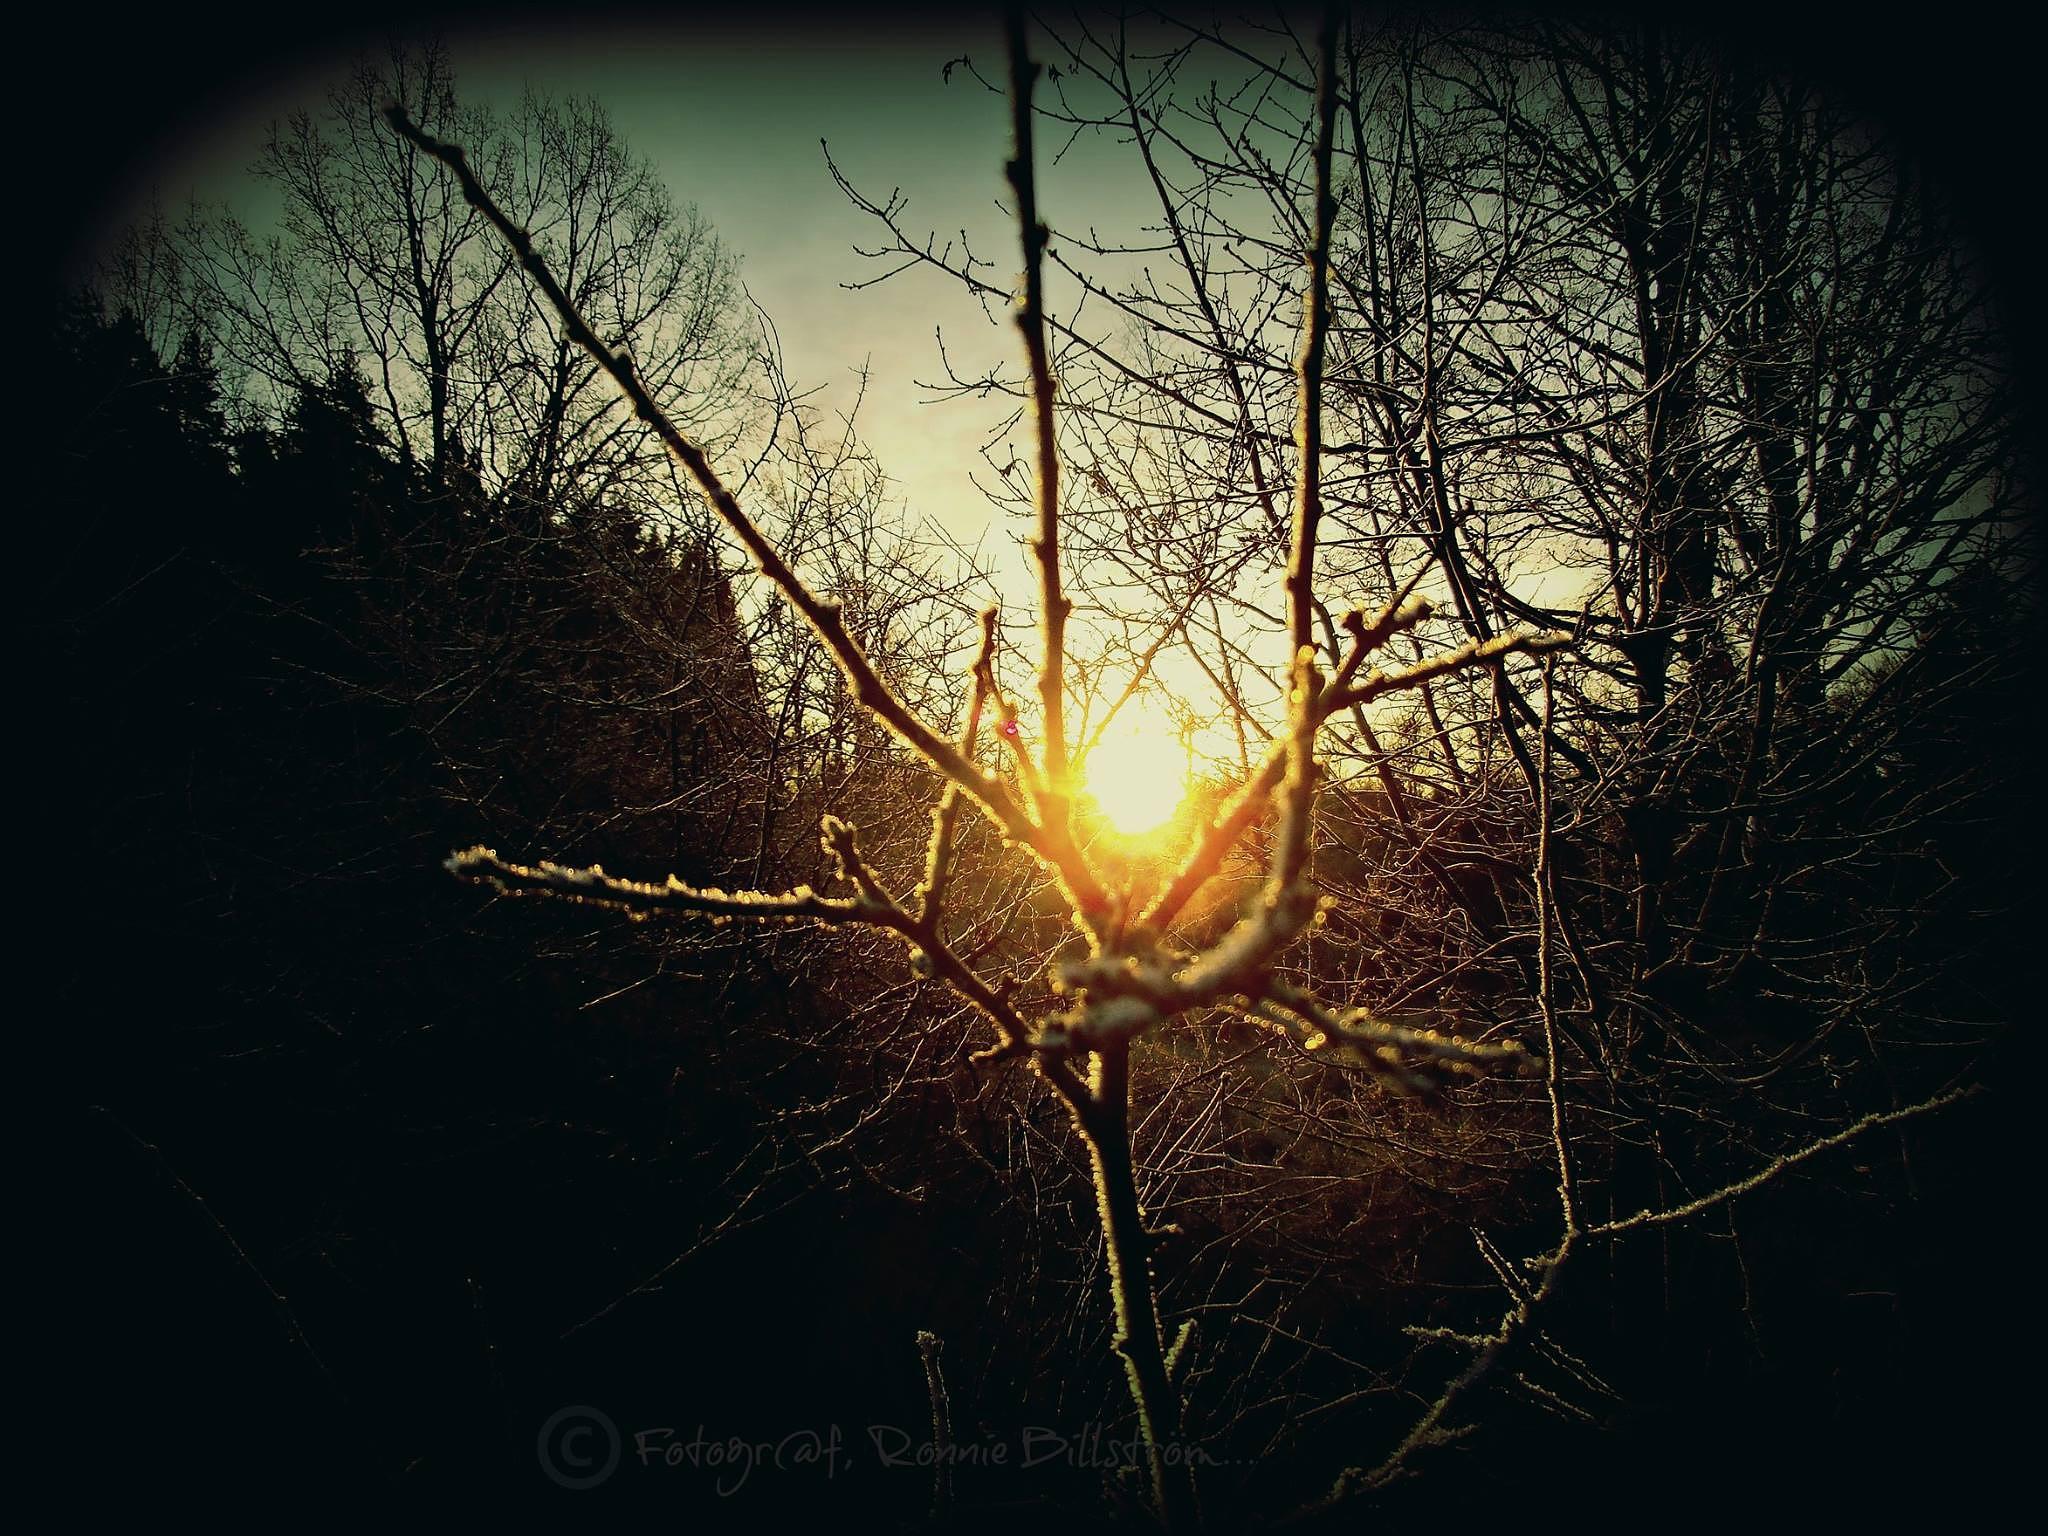 Morning Sun by ronnie.billstrom